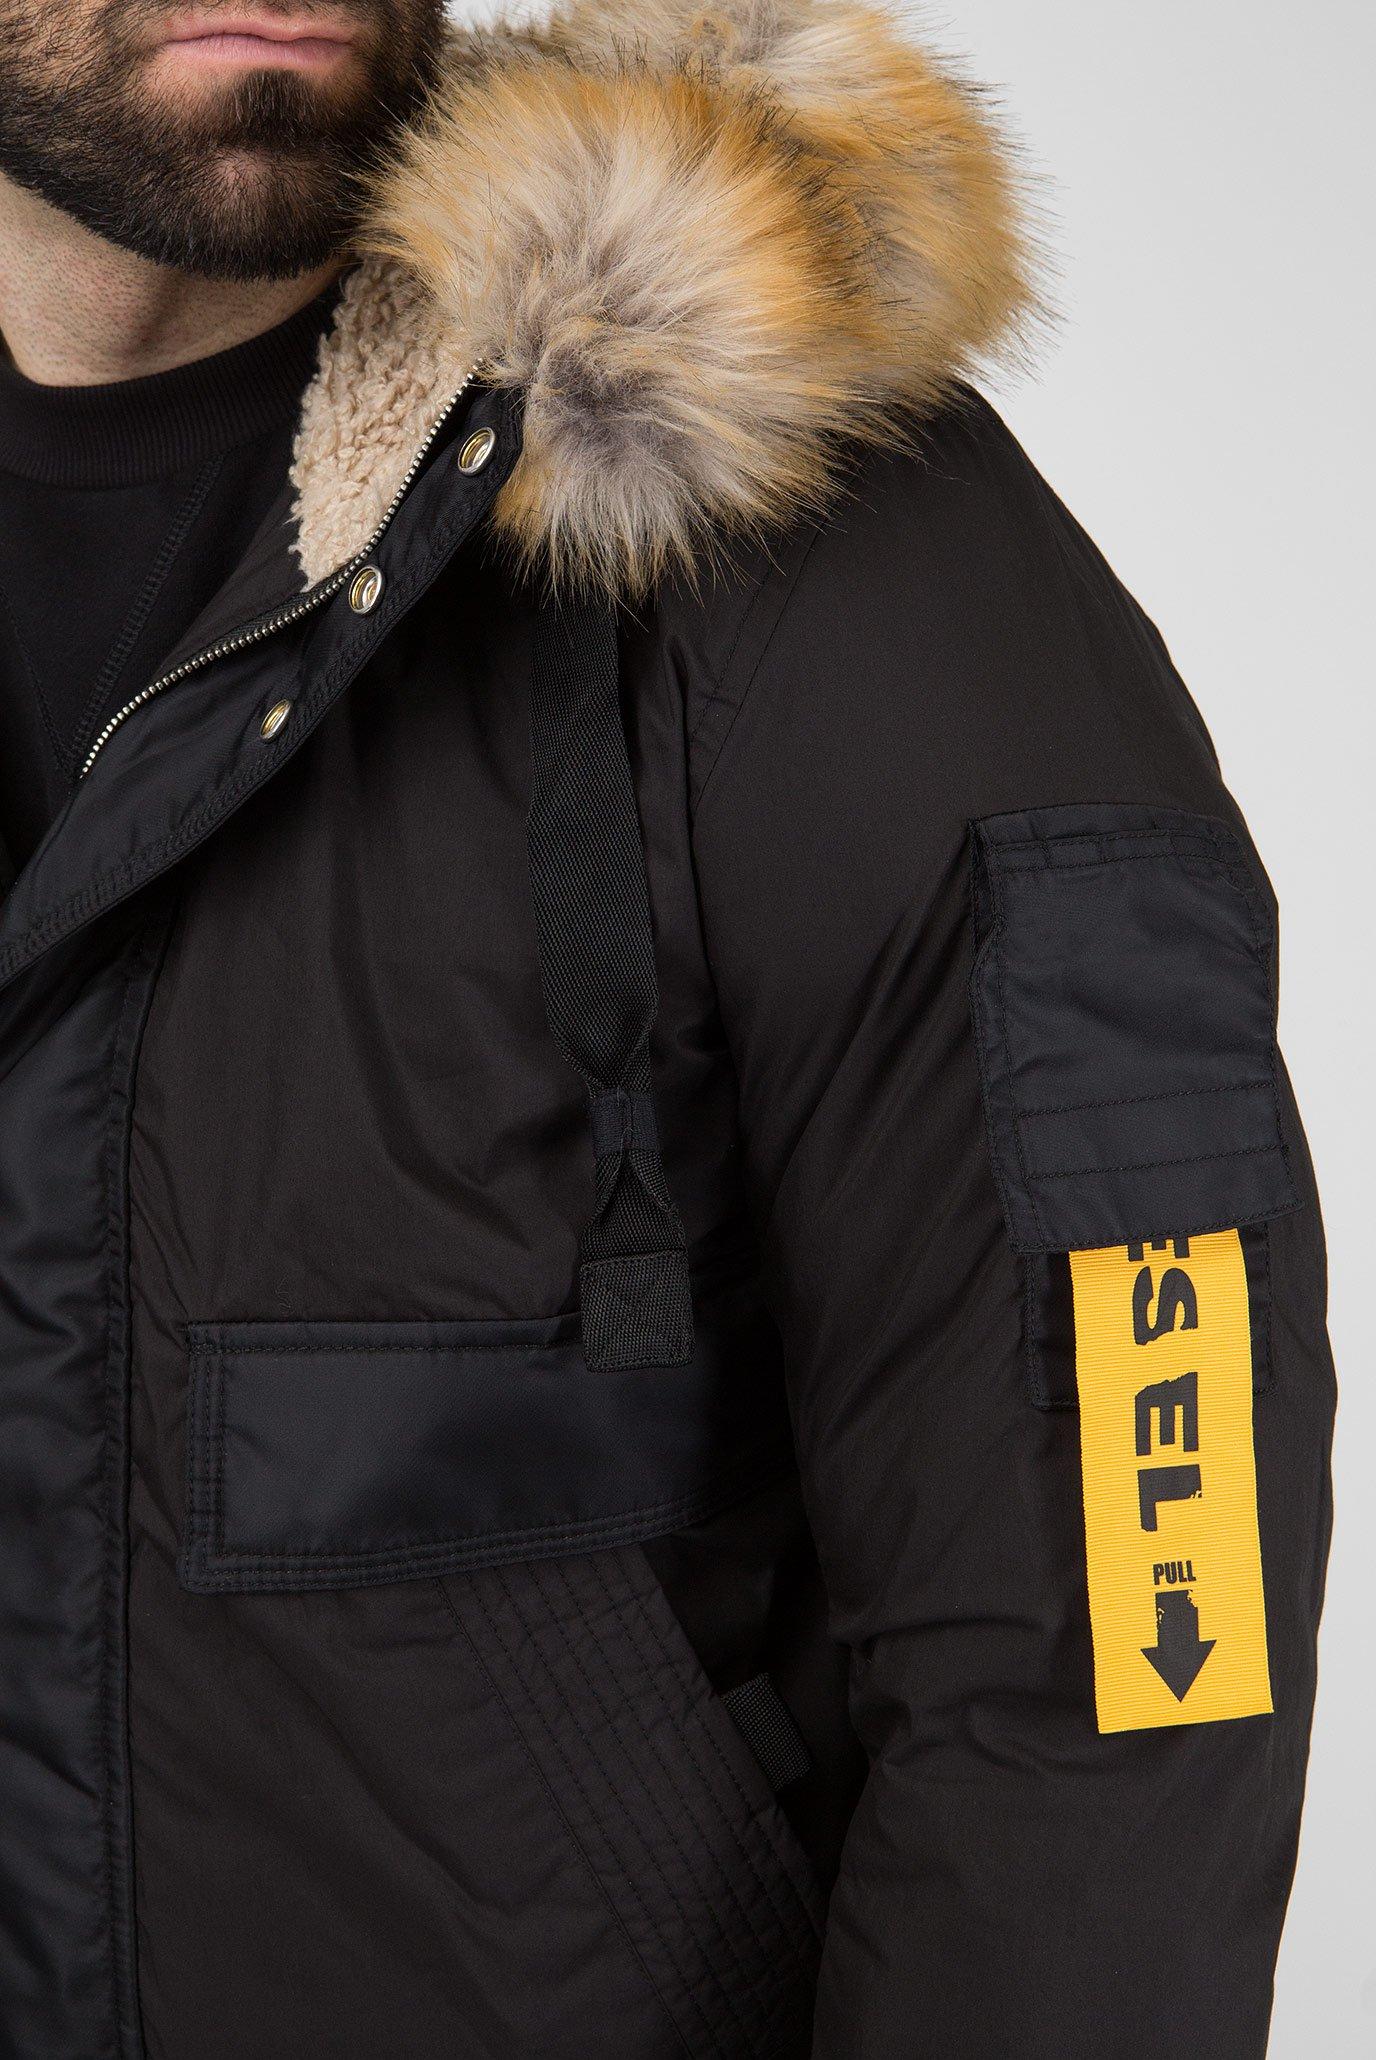 Купить Мужская черная куртка W-BURKE GIACCA Diesel Diesel 00SIEF 0GAQD – Киев, Украина. Цены в интернет магазине MD Fashion